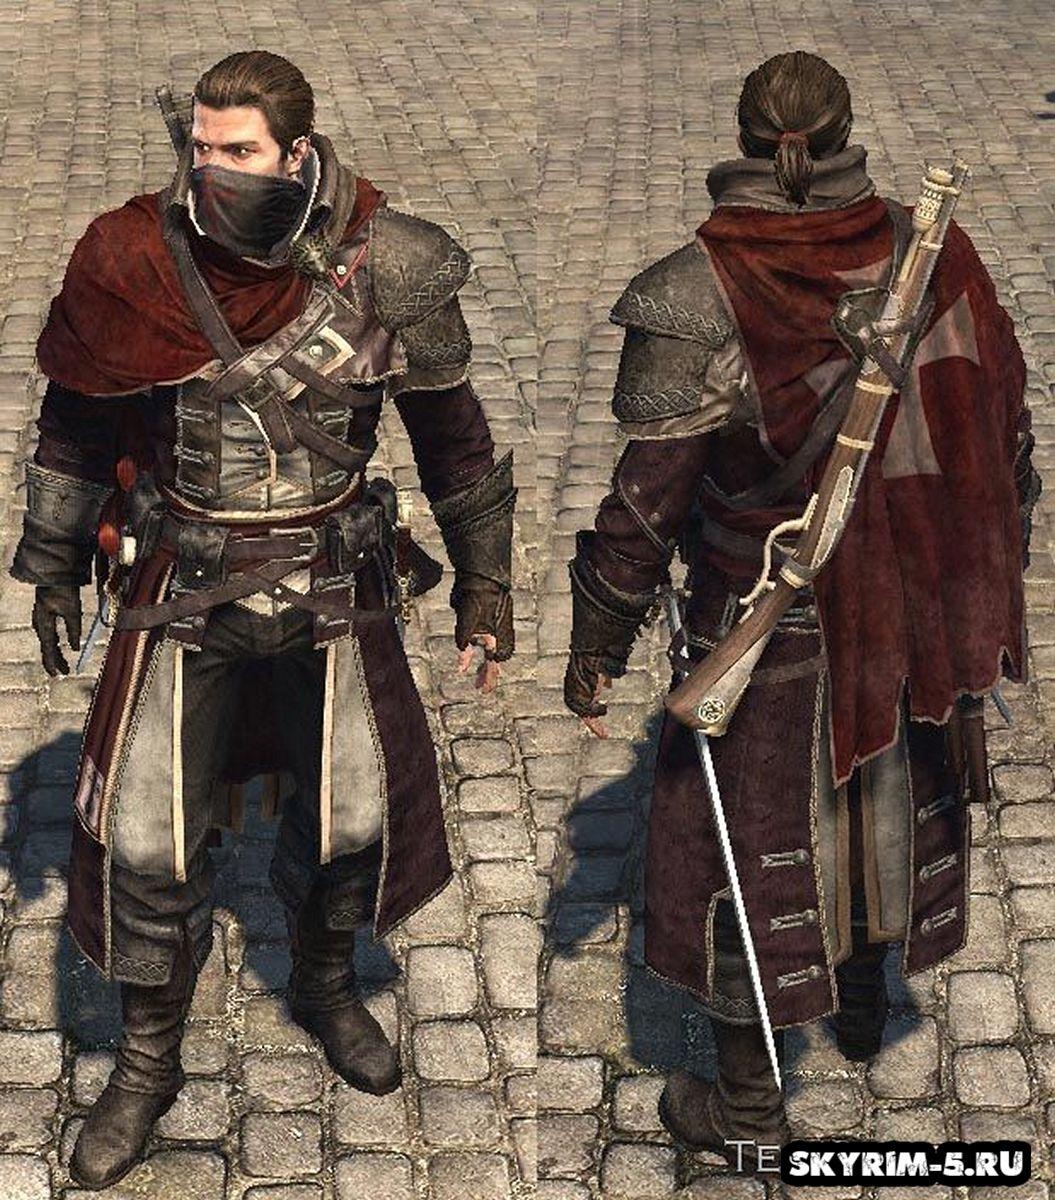 Броня Ассасина из Assassin's Creed RogueМоды Скайрим > Броня и одежда Скайрим